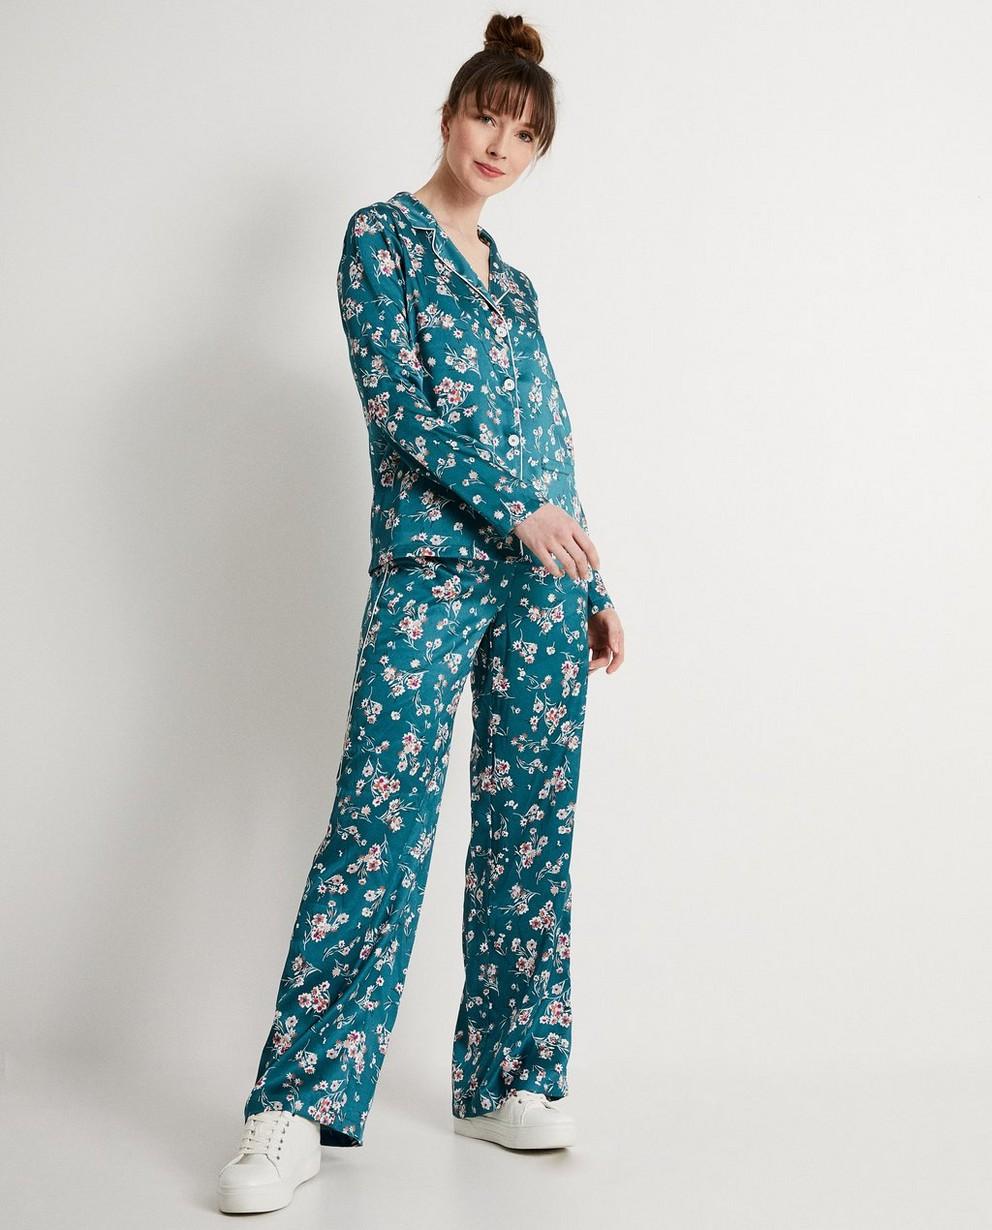 Pantalon souple vert - imprimé fleuri - JBC